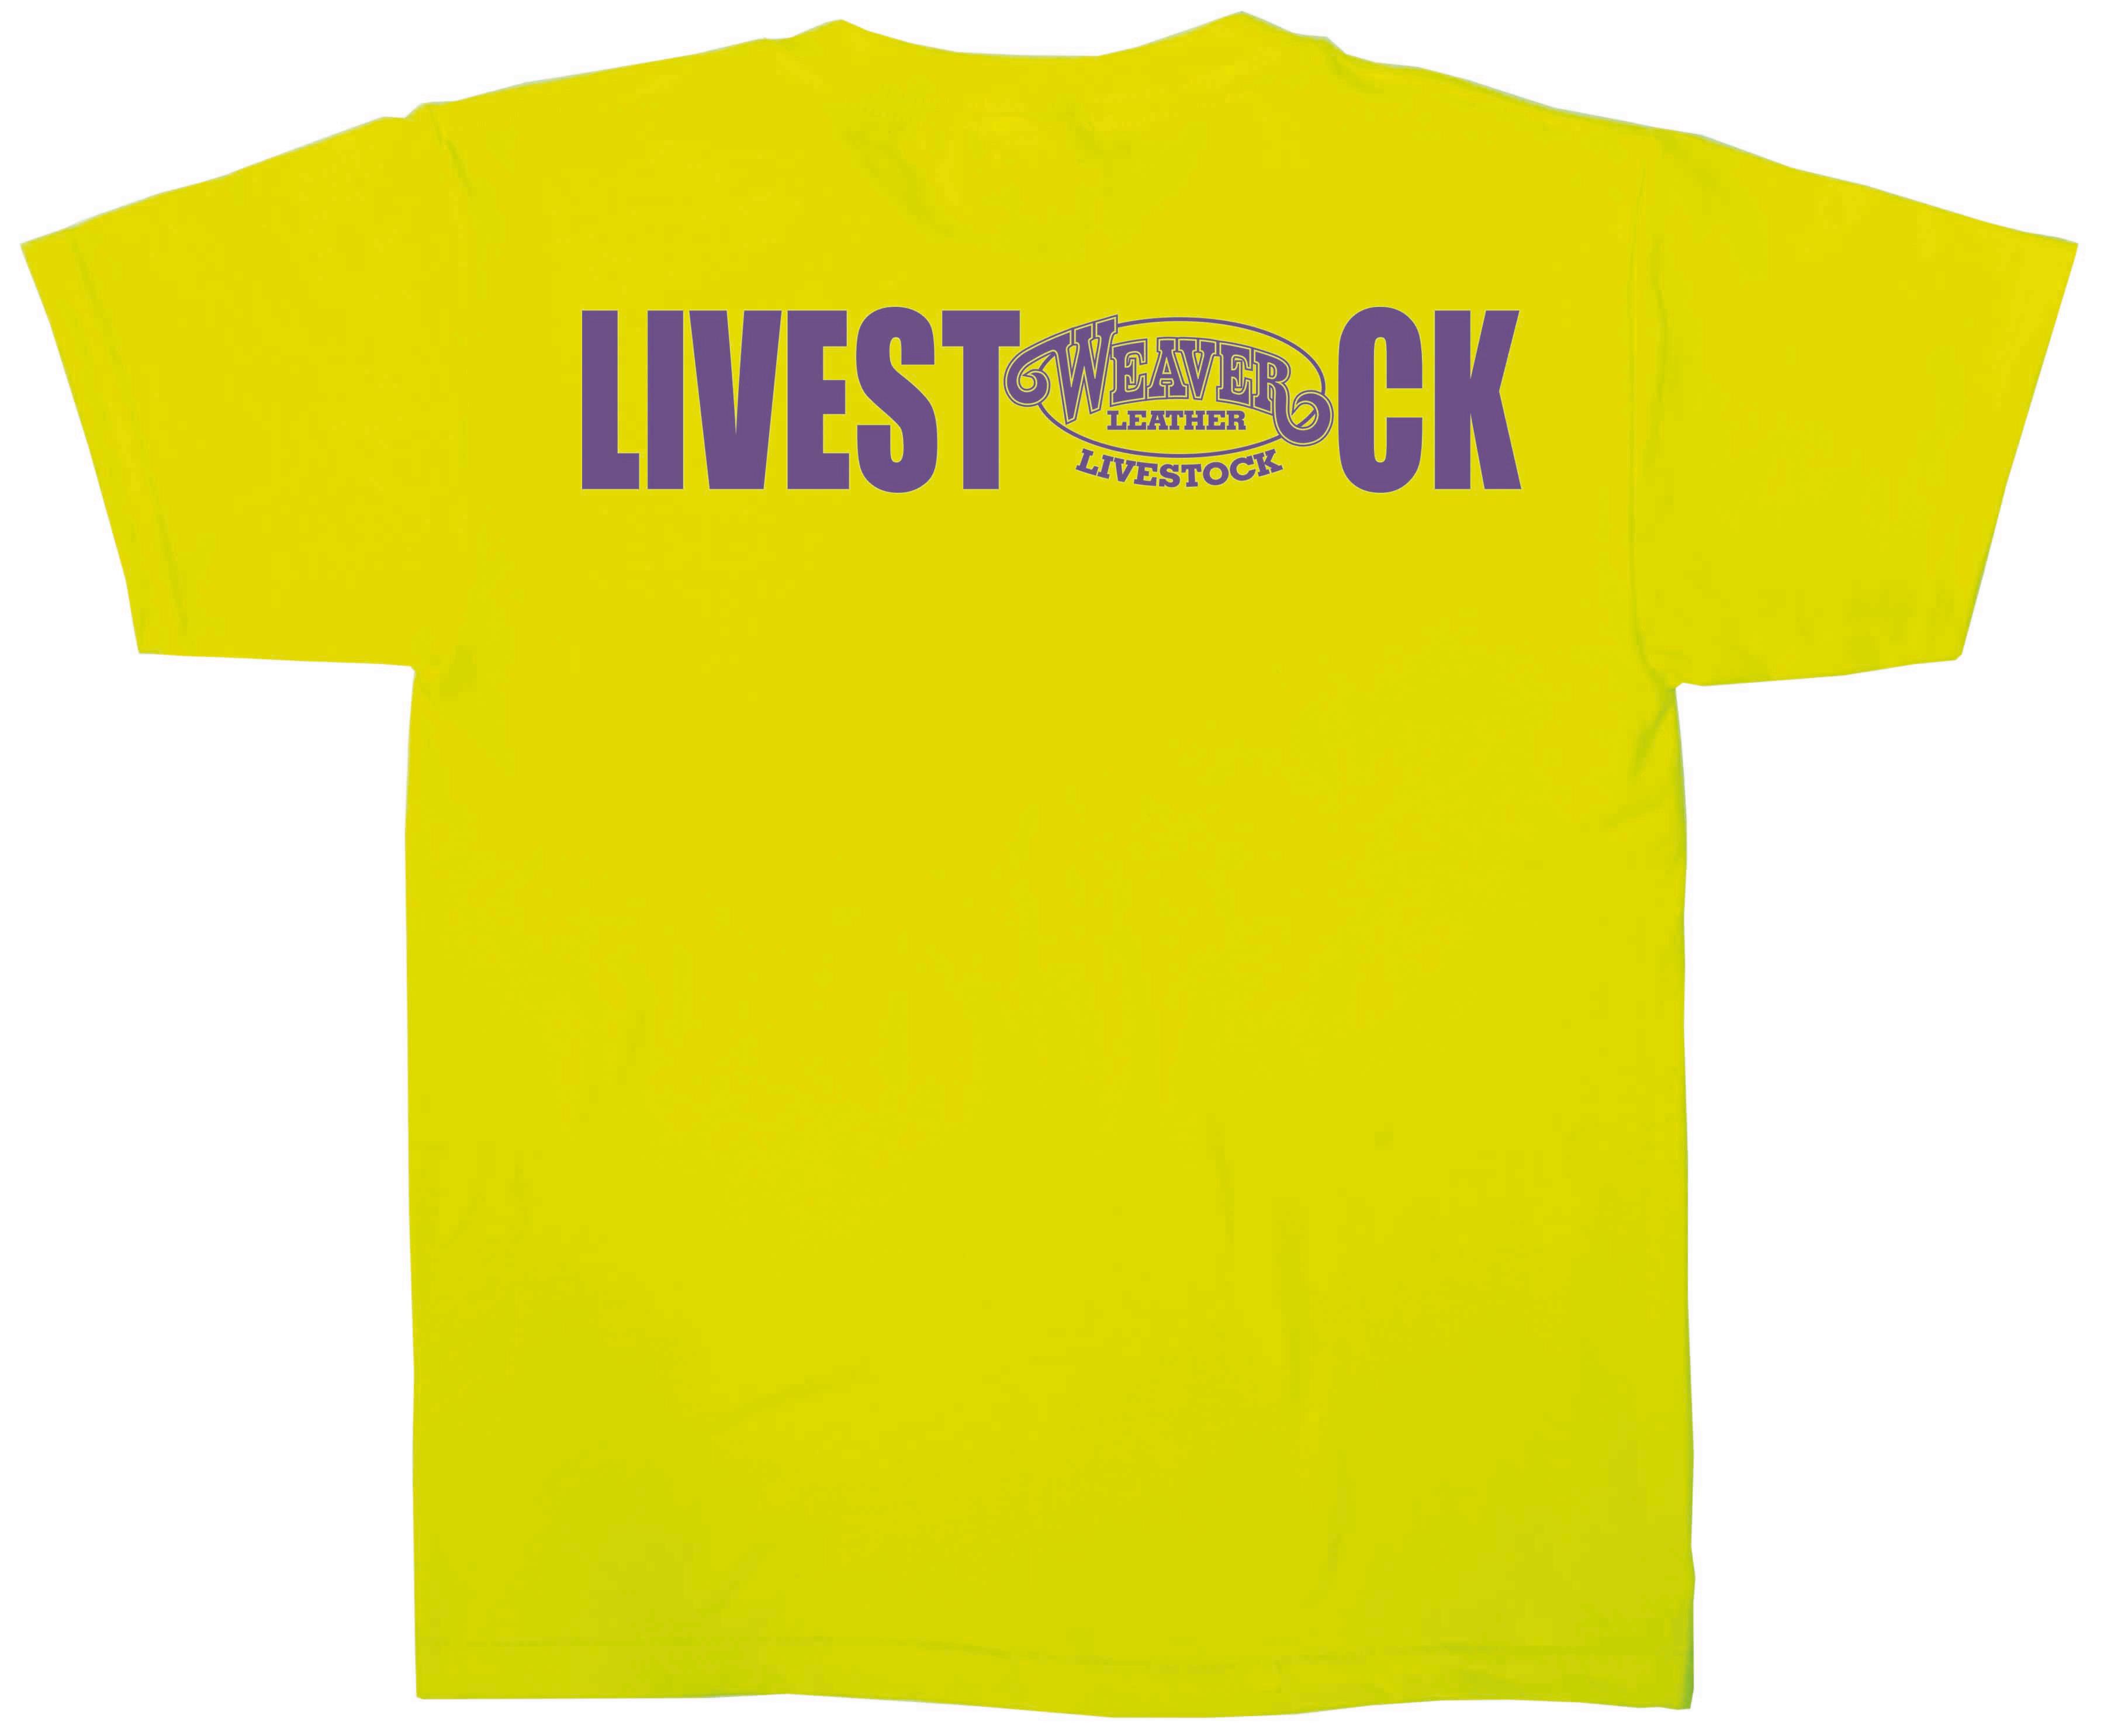 Weaver Youth Livestock T-Shirt